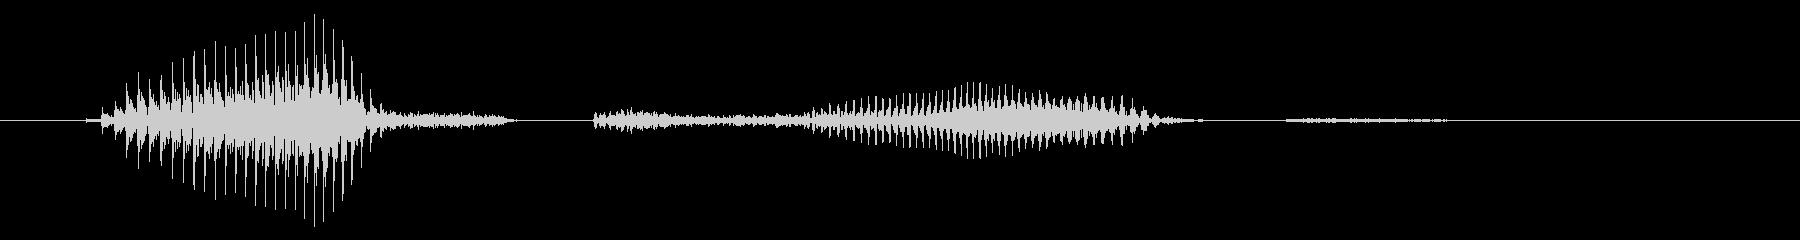 escapeの未再生の波形